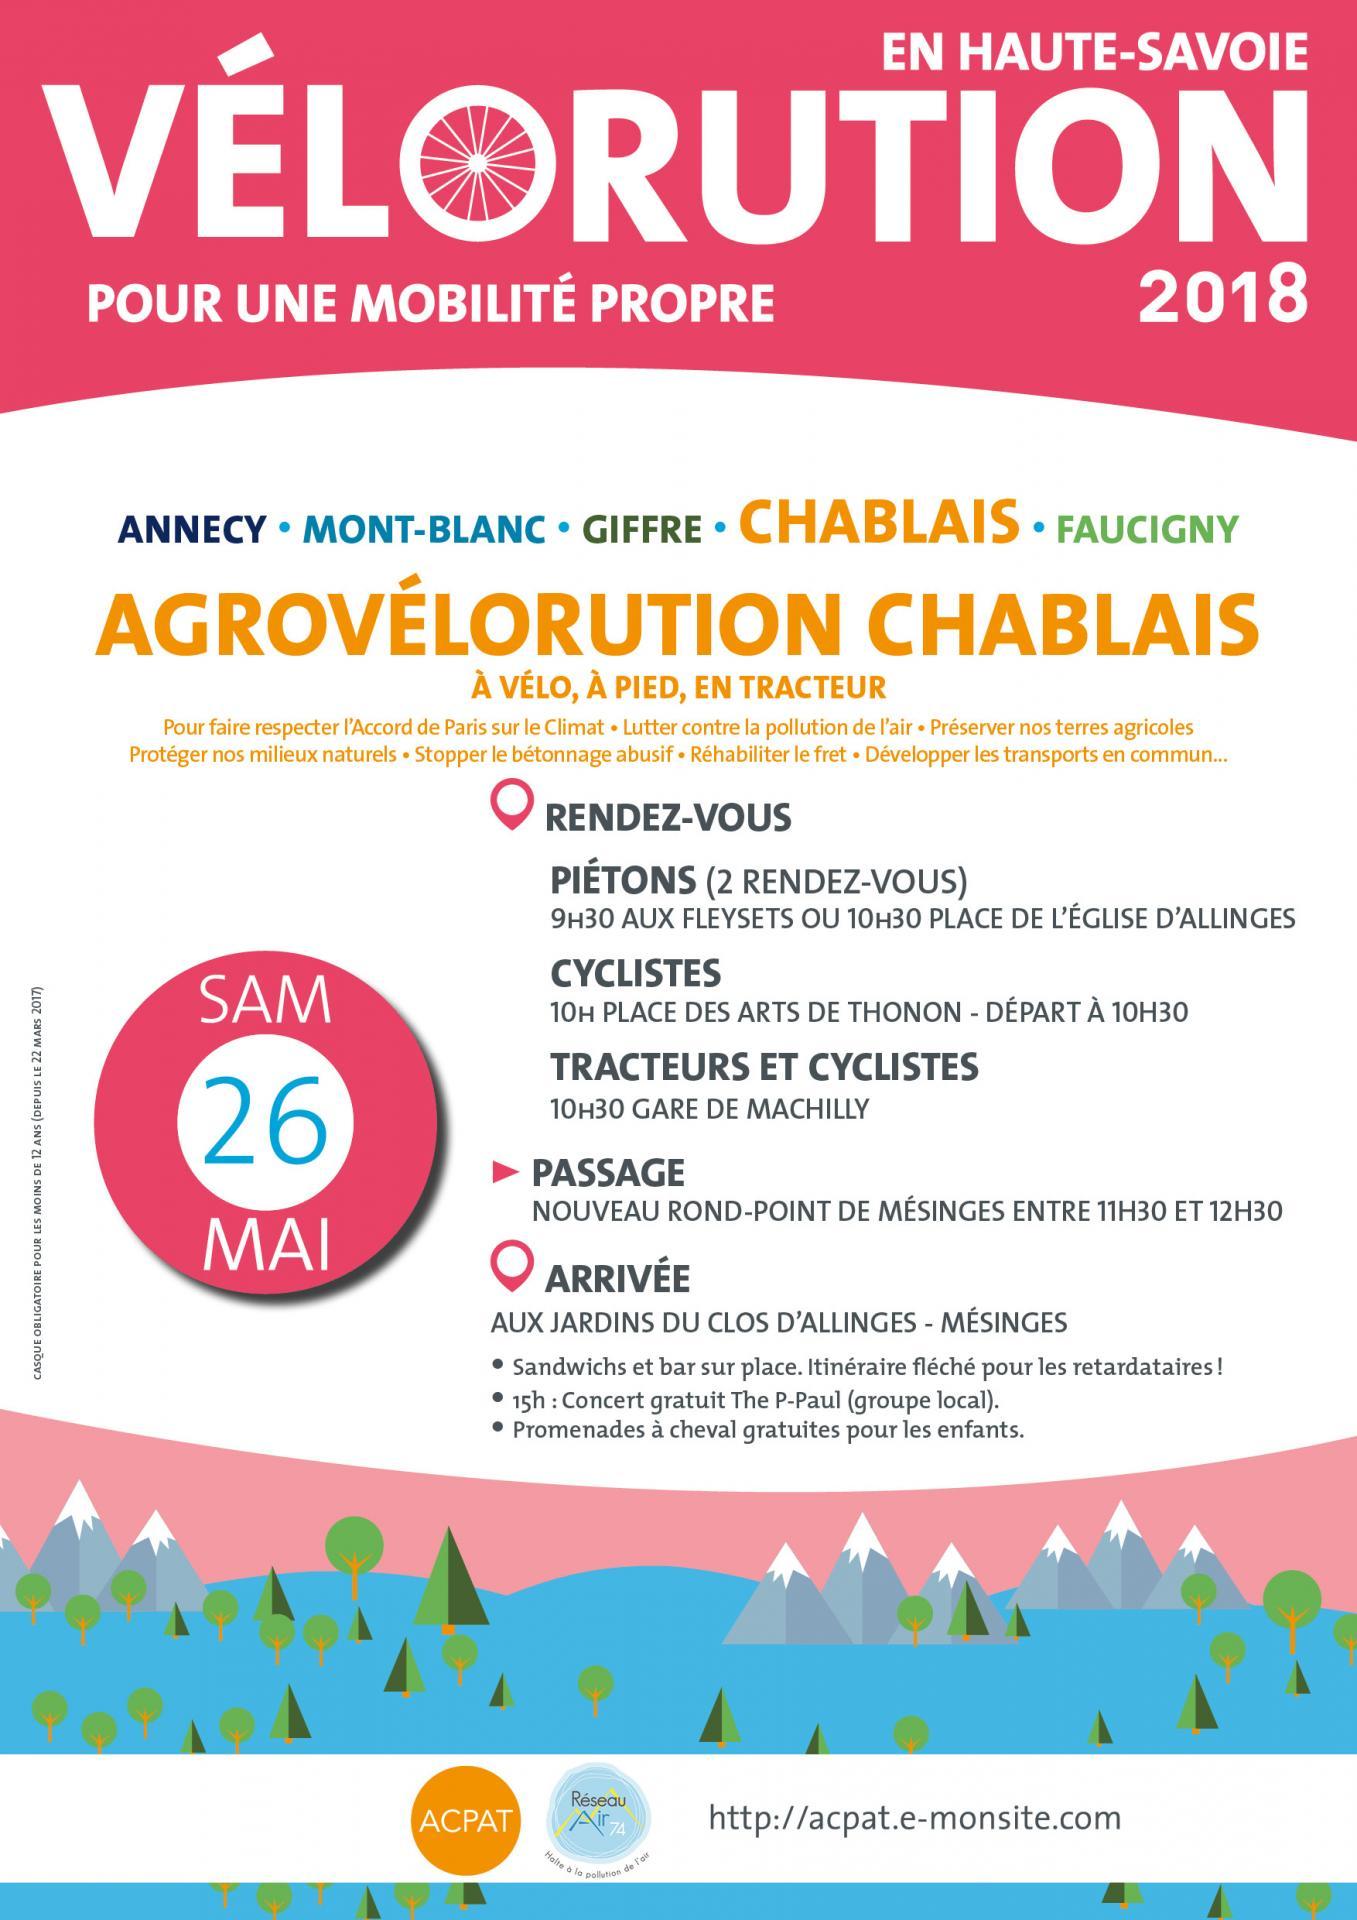 Ve lorution 2018 chablais